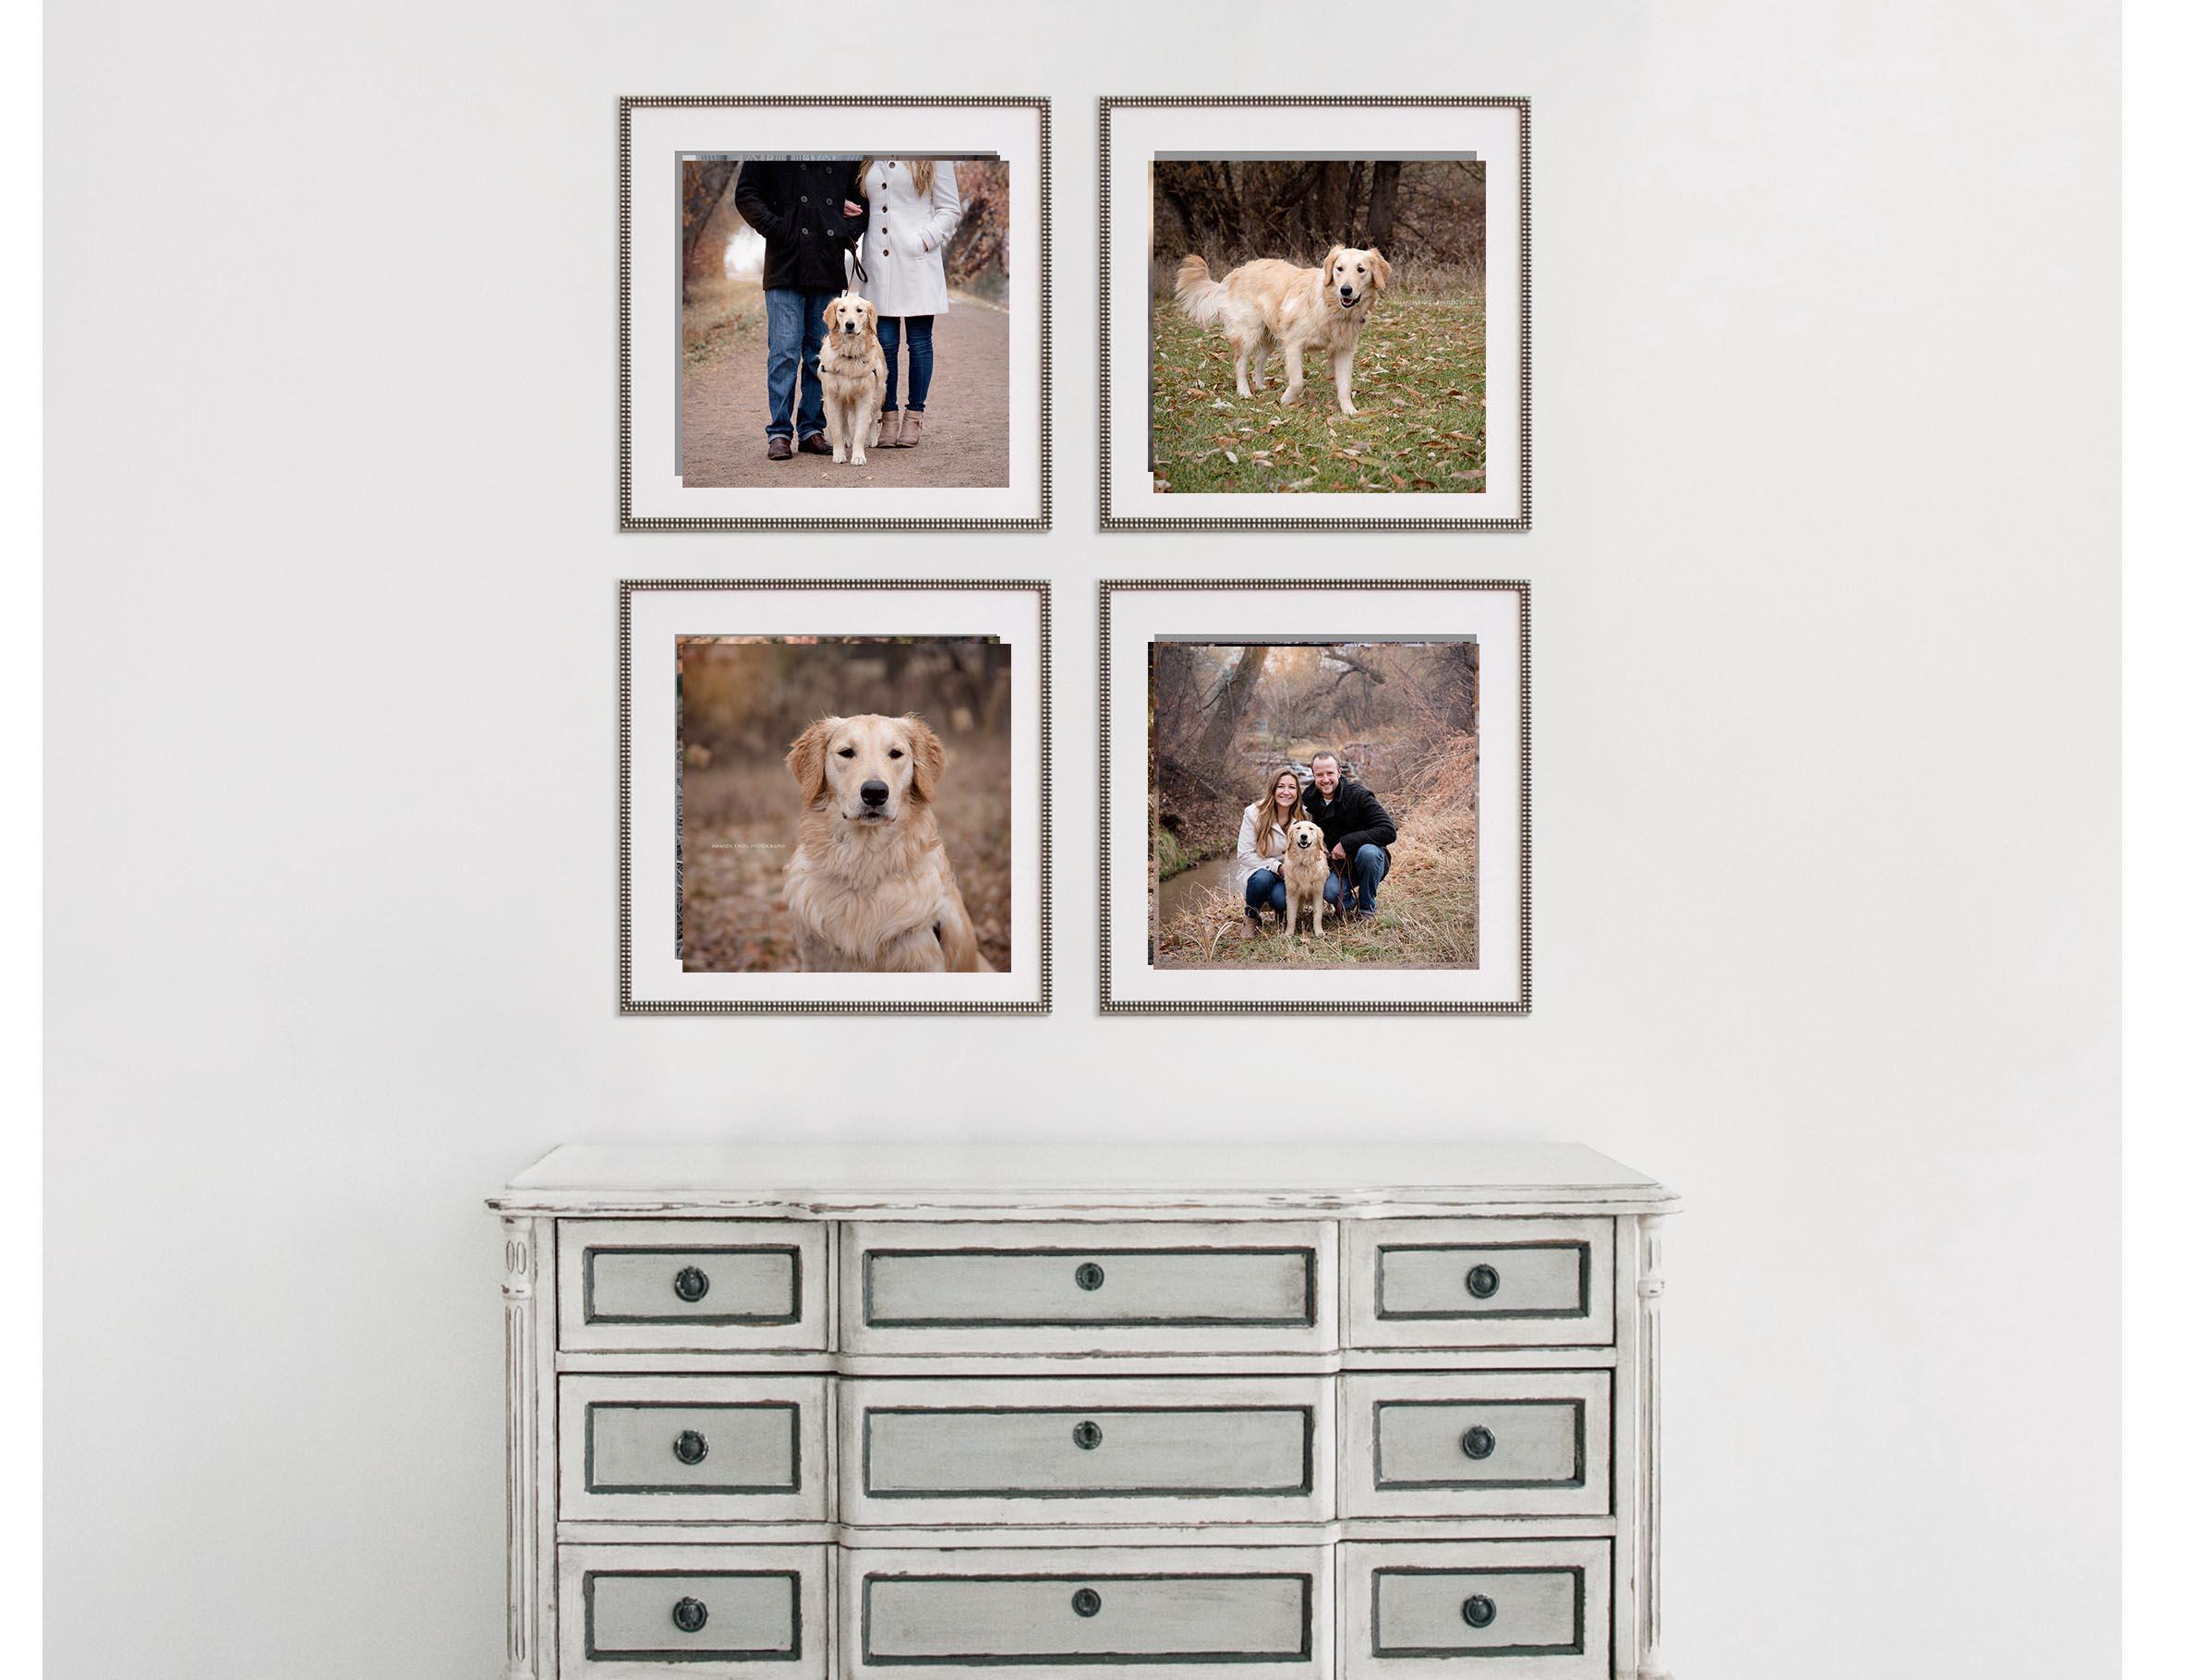 Dog and picture frames v2.jpg